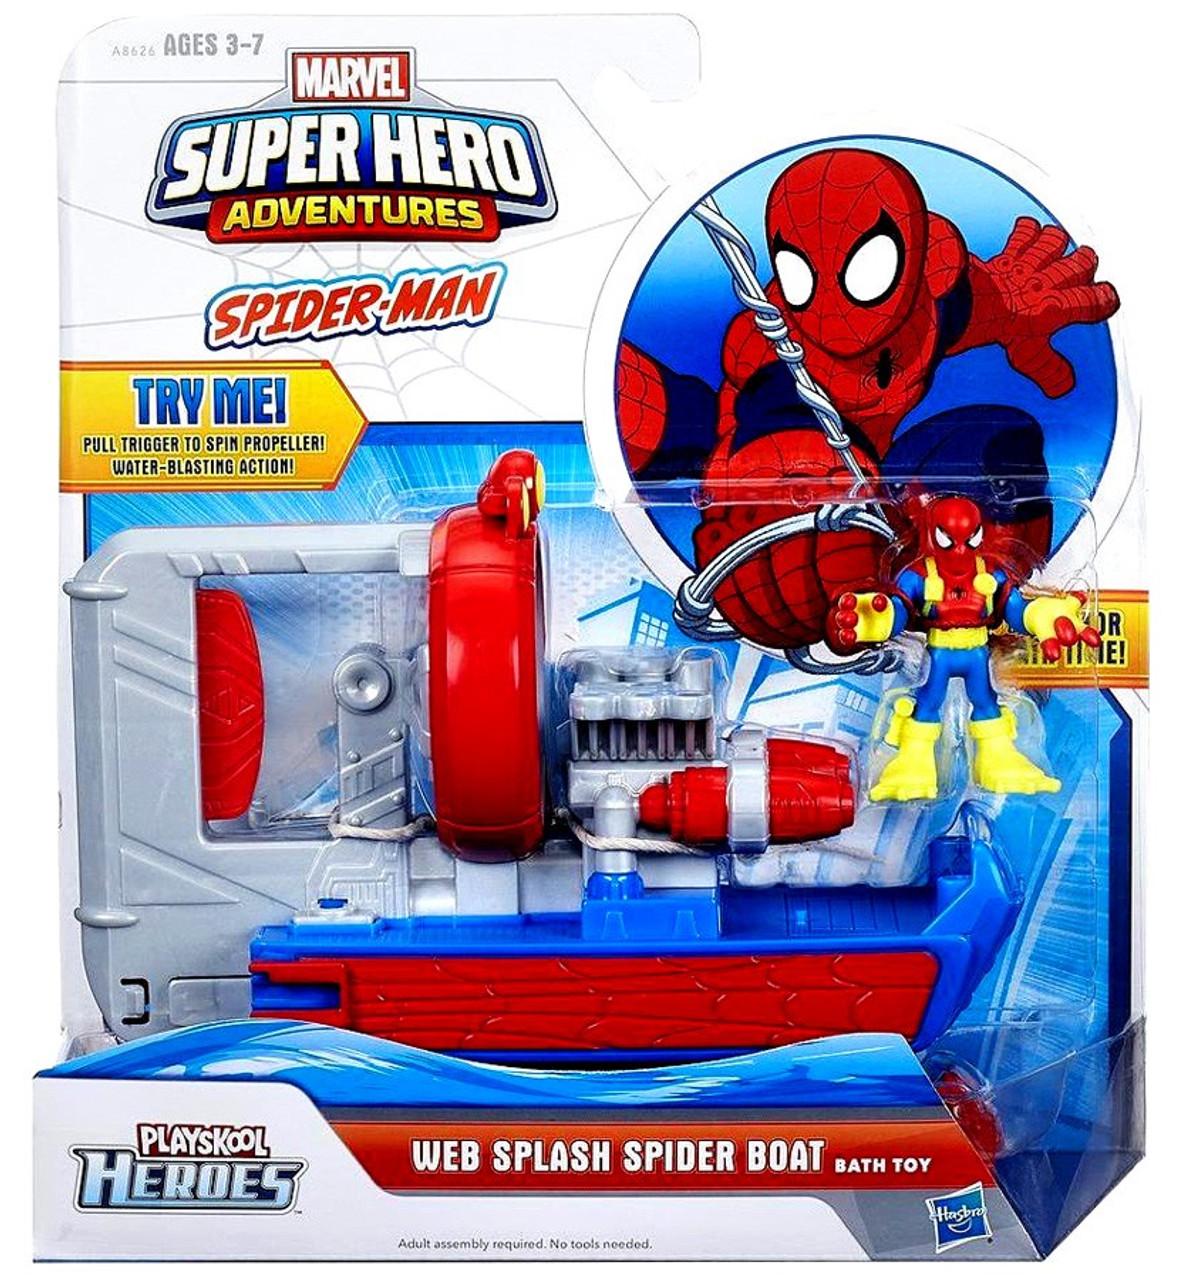 Spider Man Playskool Heroes Super Hero Adventures Web Splash Spider Boat  Bath Toy